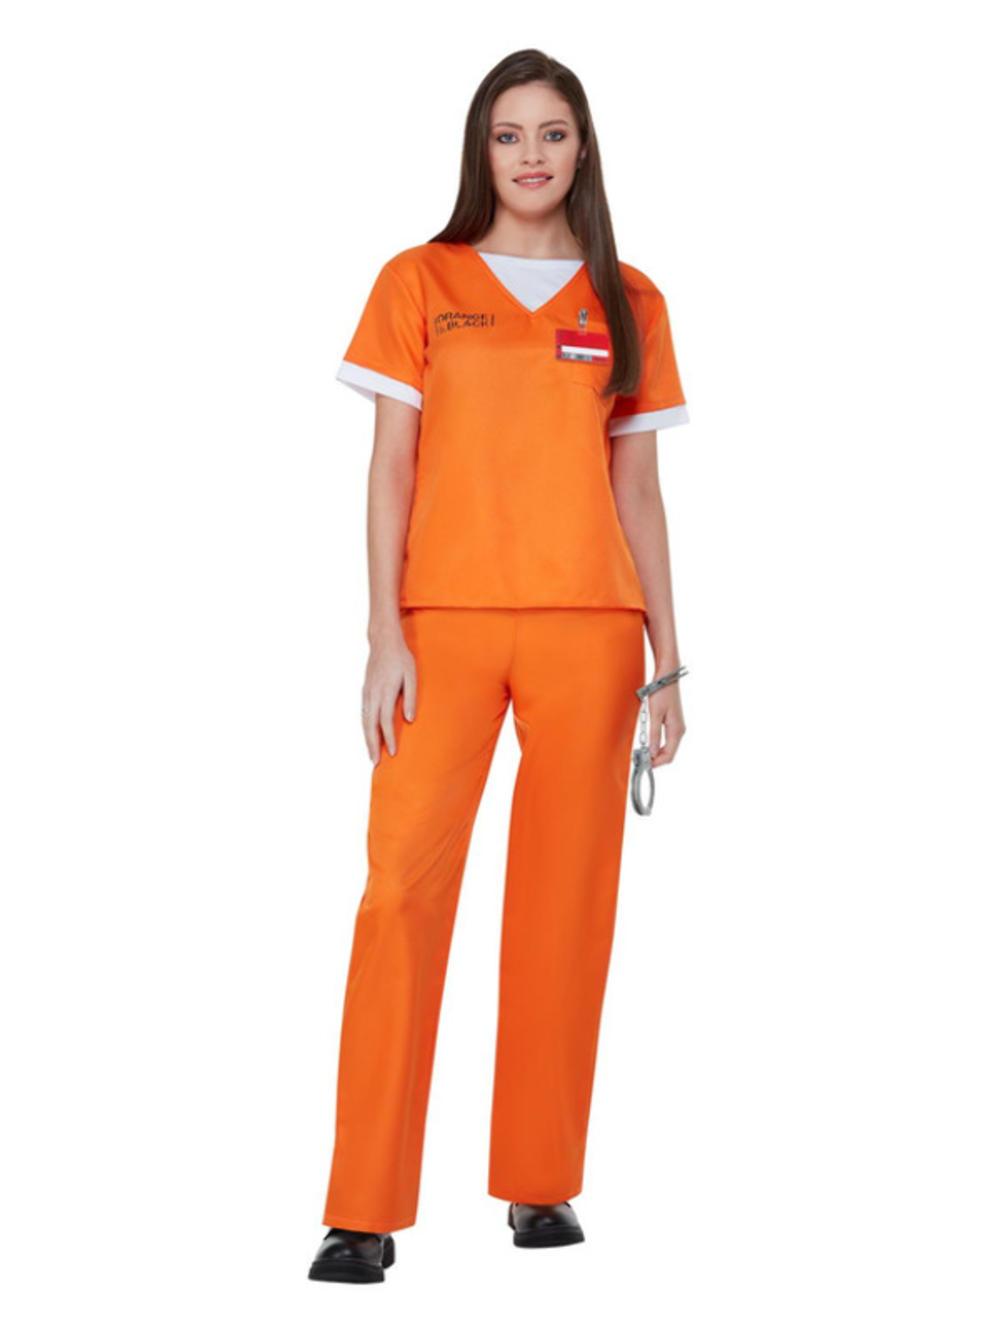 Orange is The New Black Prison Uniform Costume